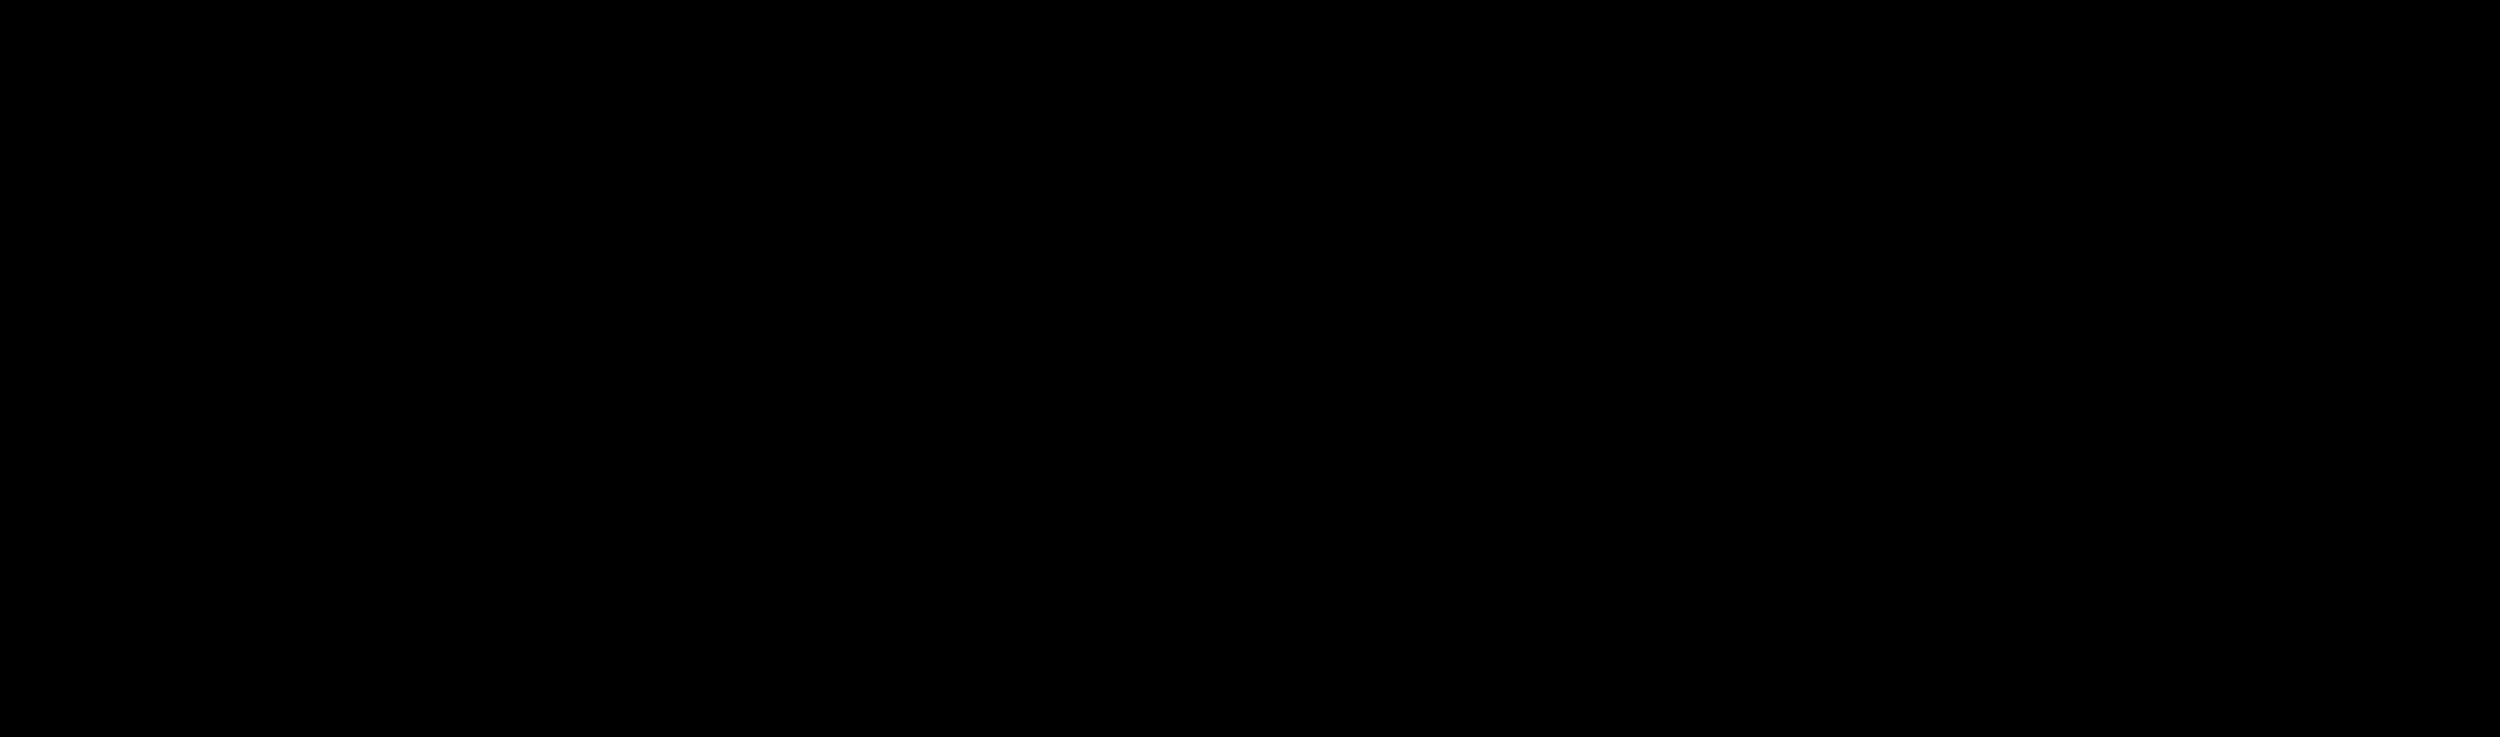 domino_logo-01 copy_black.png